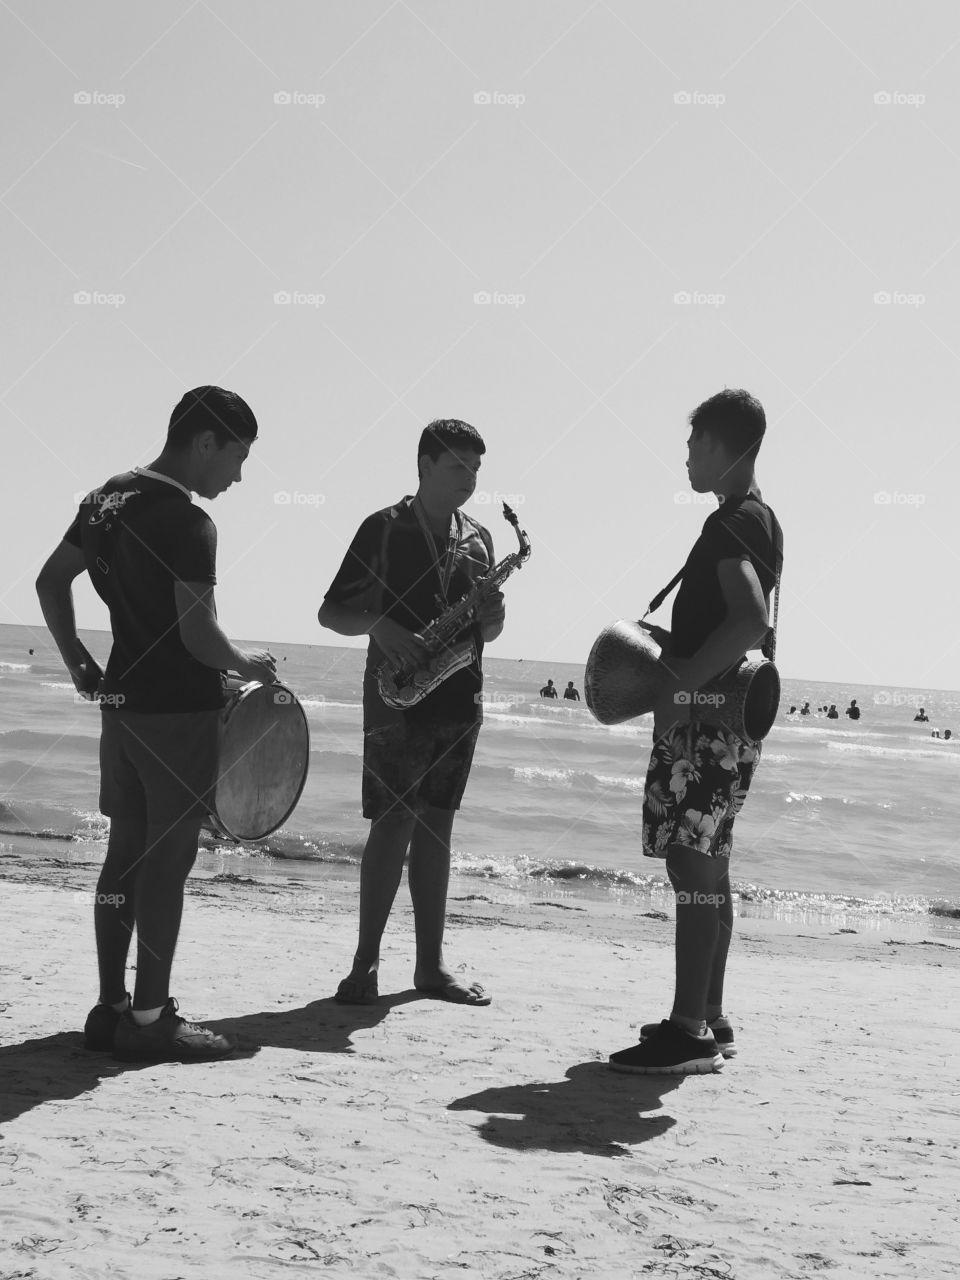 Musicians on Beach